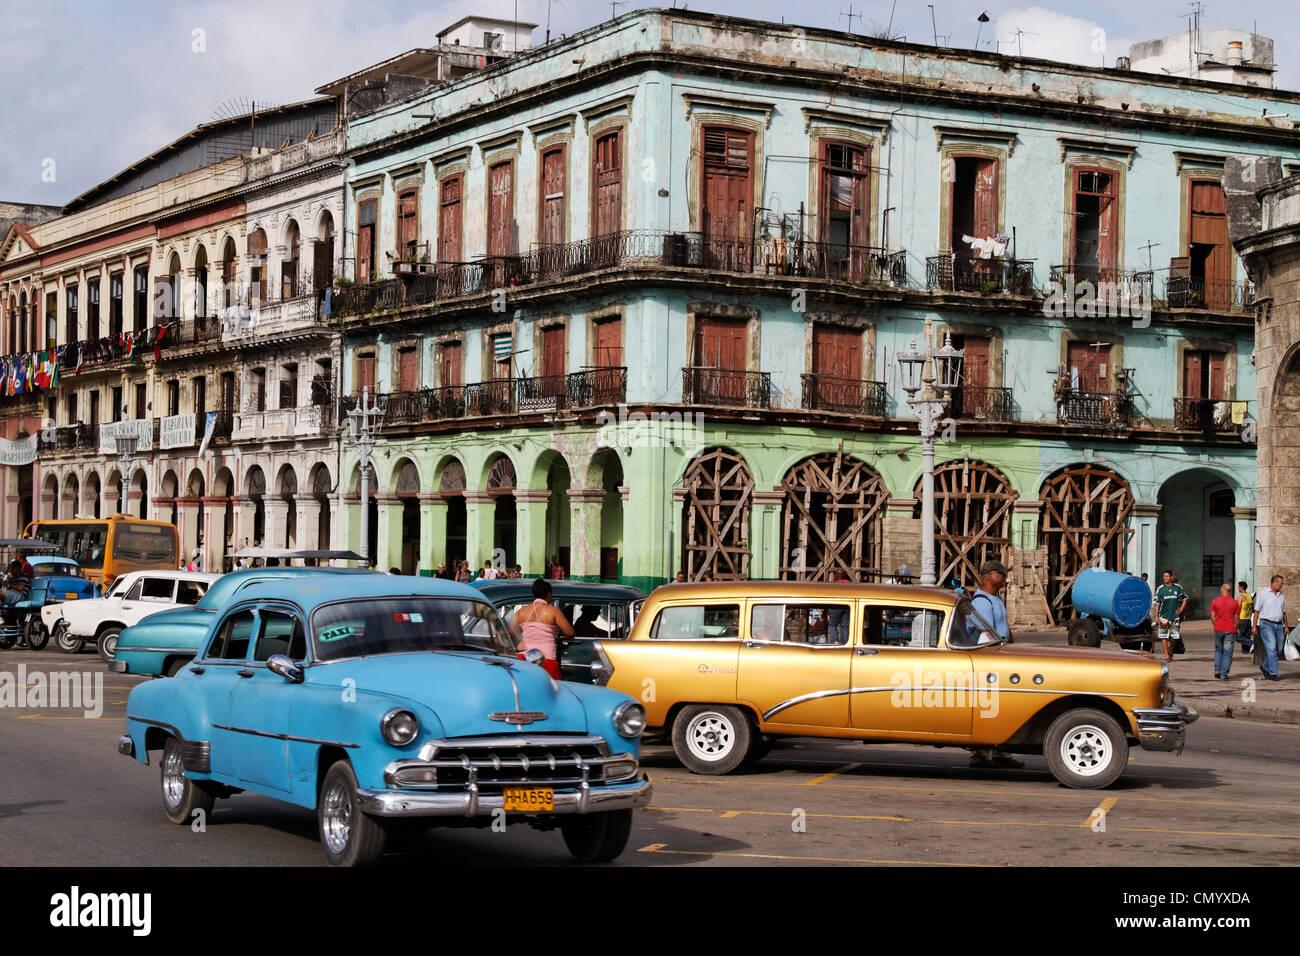 Oldtimer in Havanna Center on Paseo de Marti near Capitol, Cuba, Greater Antilles, Antilles, Carribean, West Indies, Stock Photo